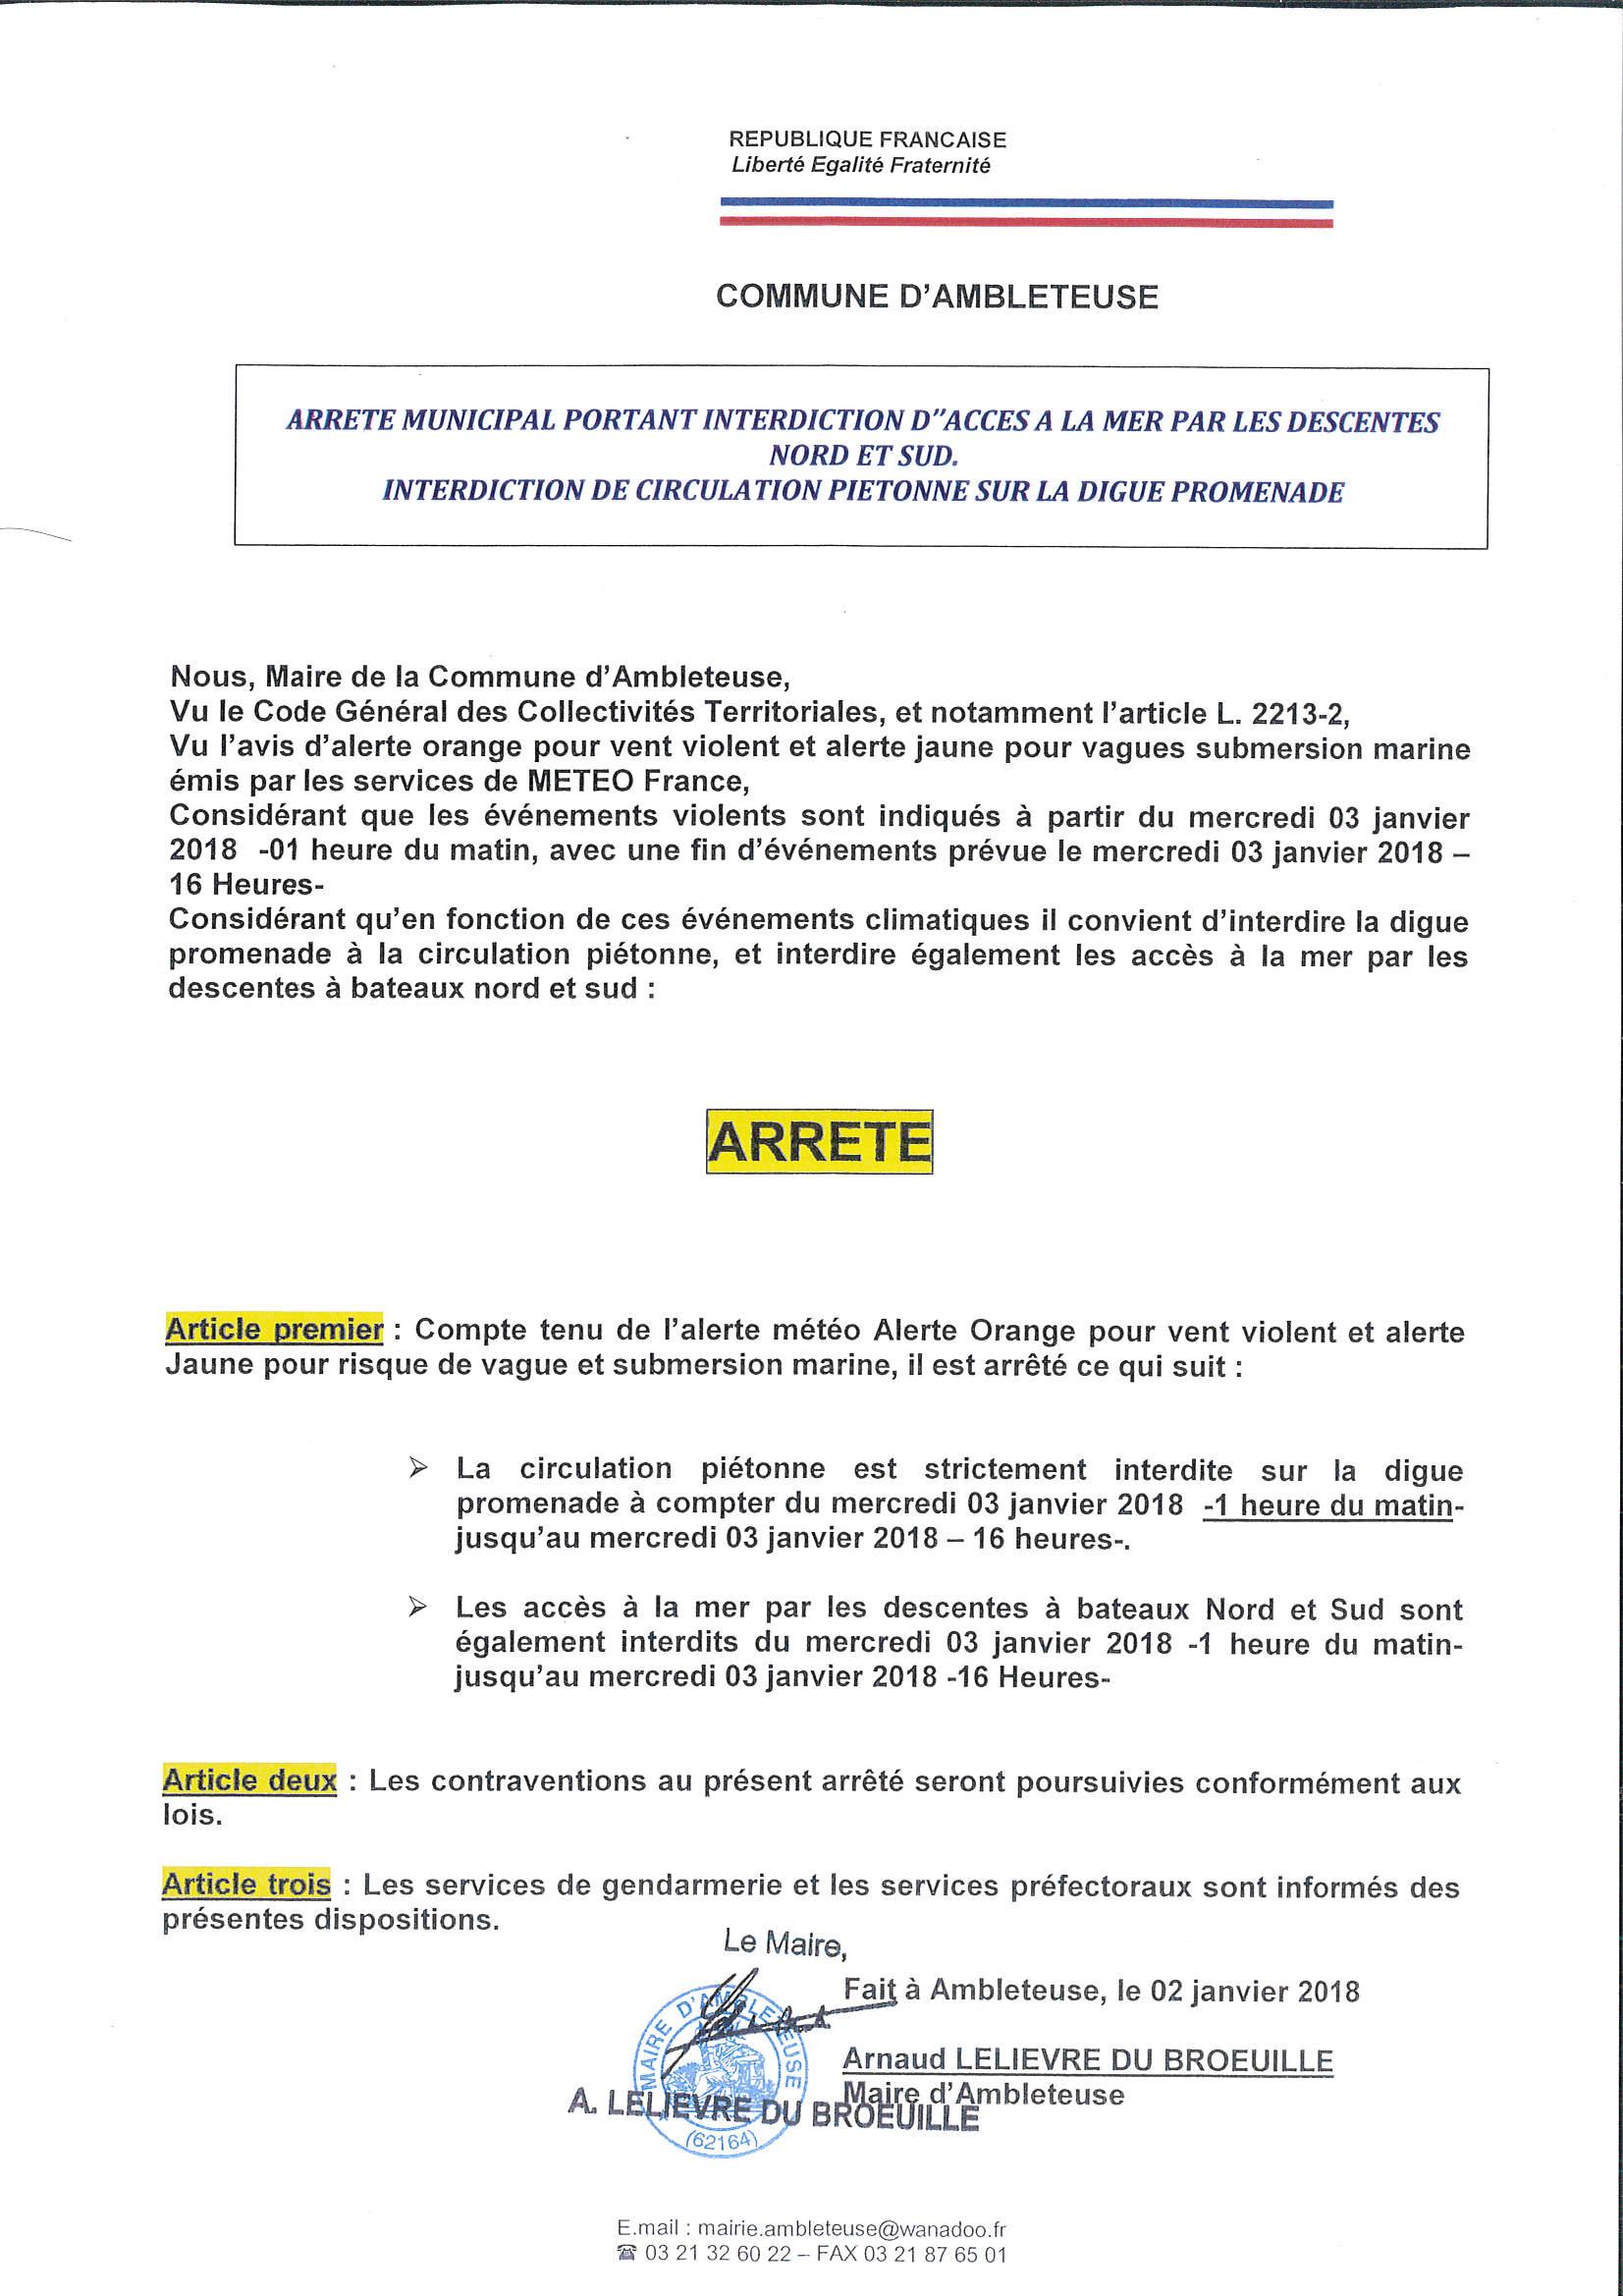 mairie-ambleteuse@orange.fr_20180102_185950_001.jpg